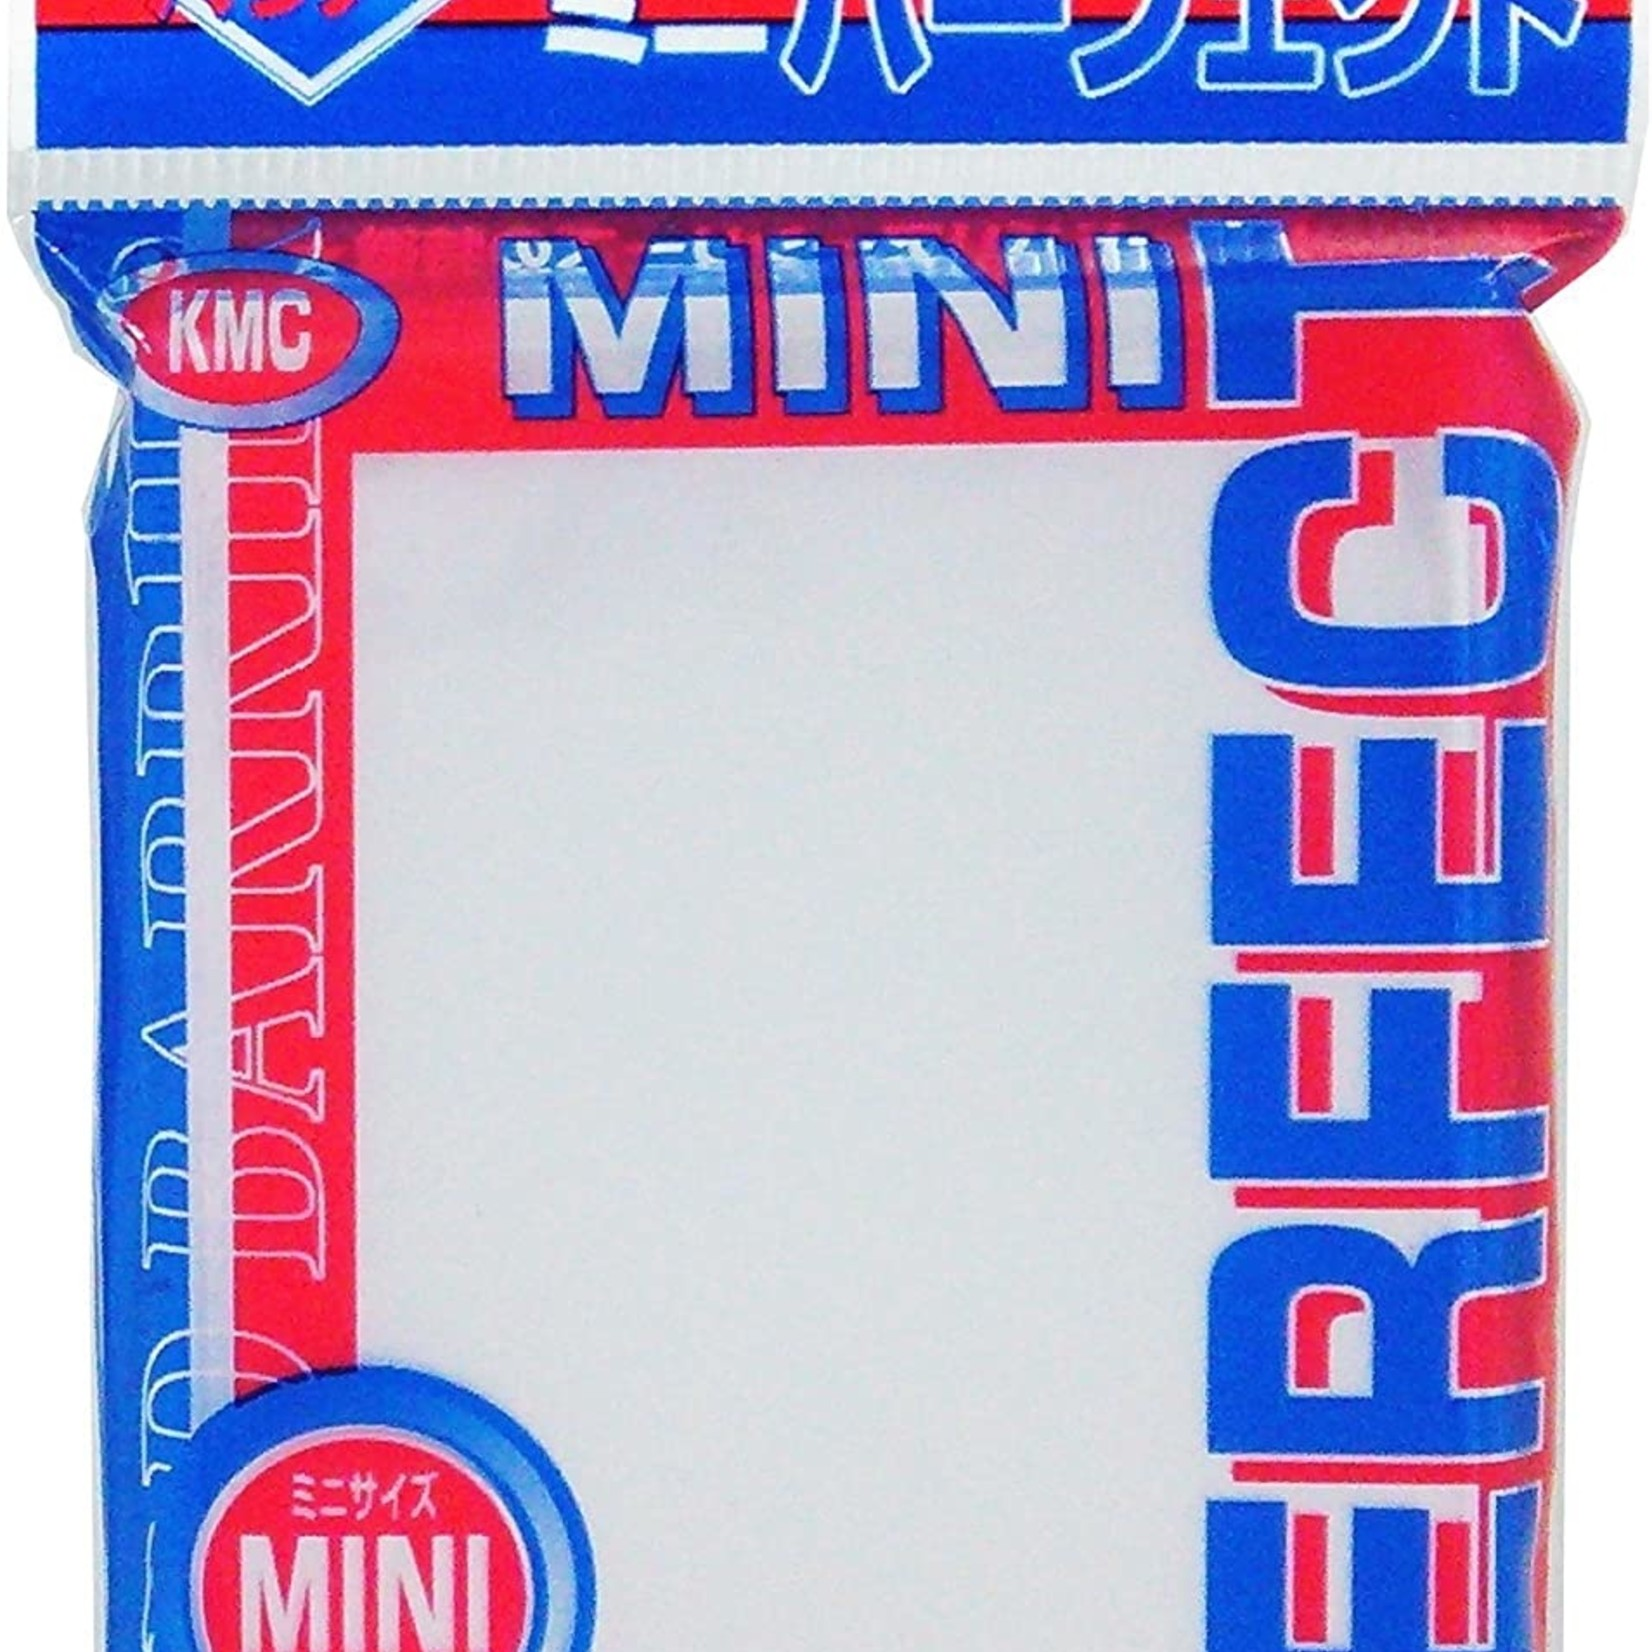 KMC KMC Mini/Japanese Perfect Fit